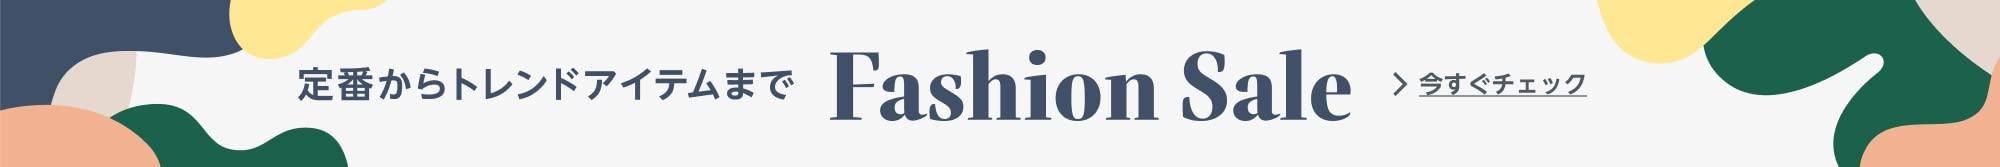 Fashion Sale 定番からトレンドアイテムまで